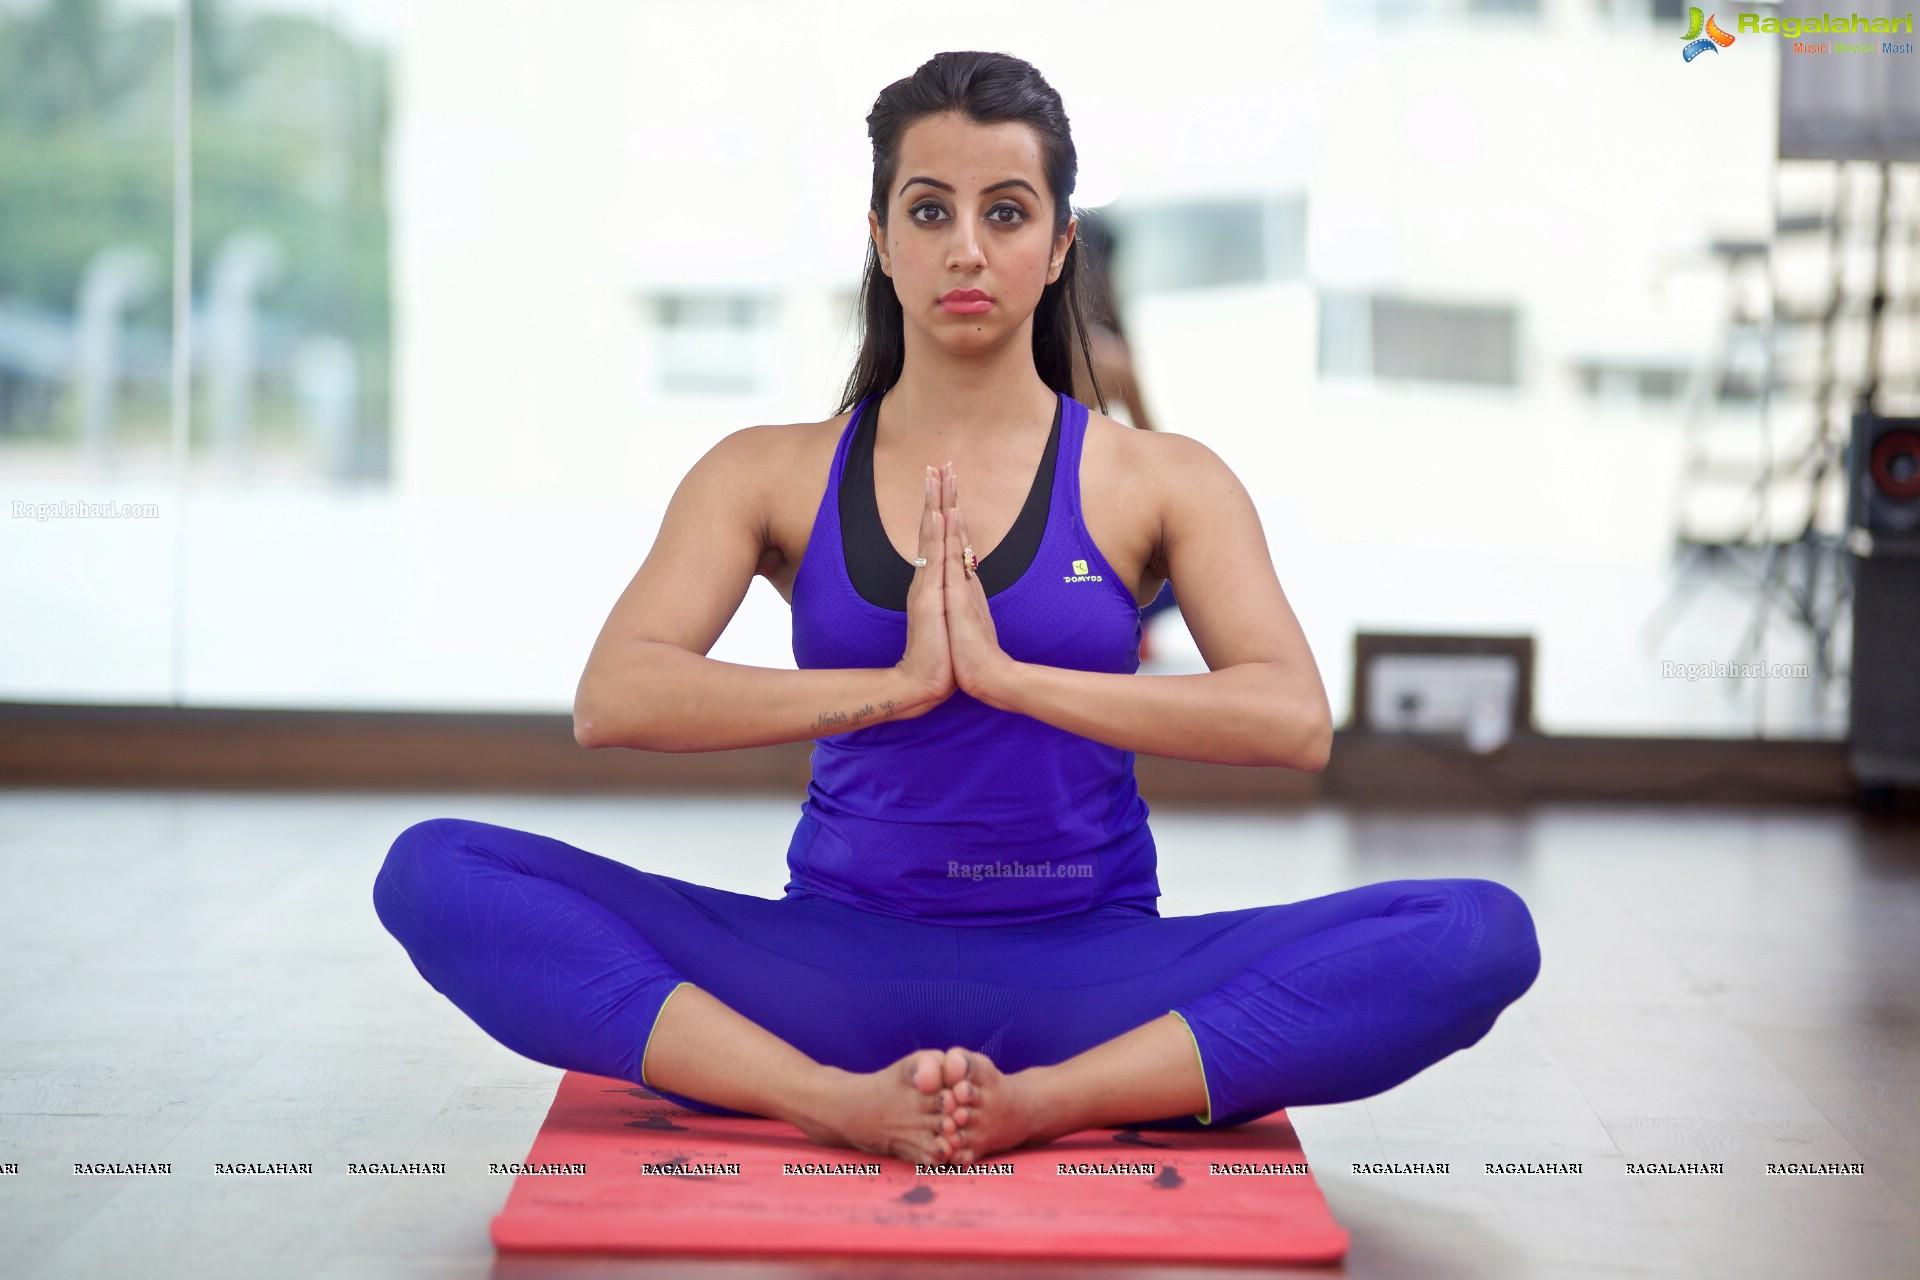 5 Yoga Teachers Who Overcame Addiction Share Stories